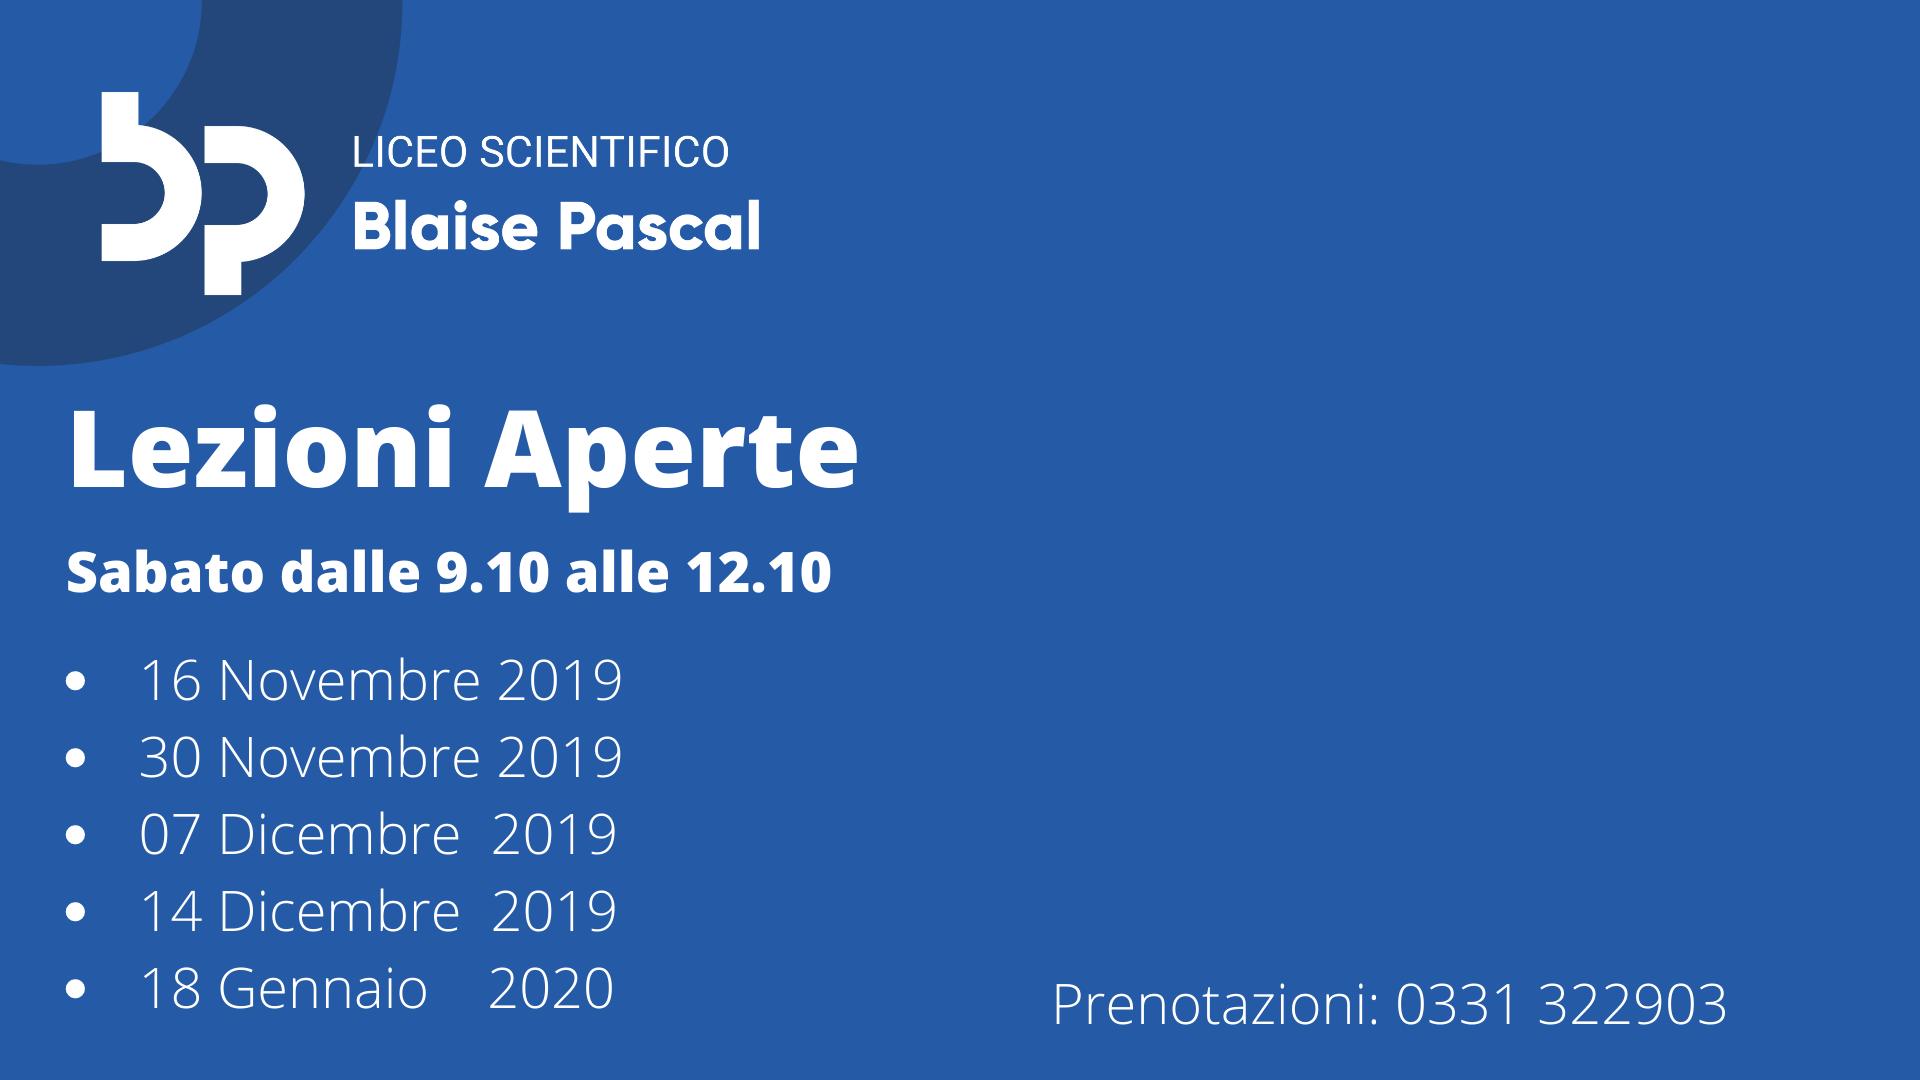 Lezioni Aperte Pascal